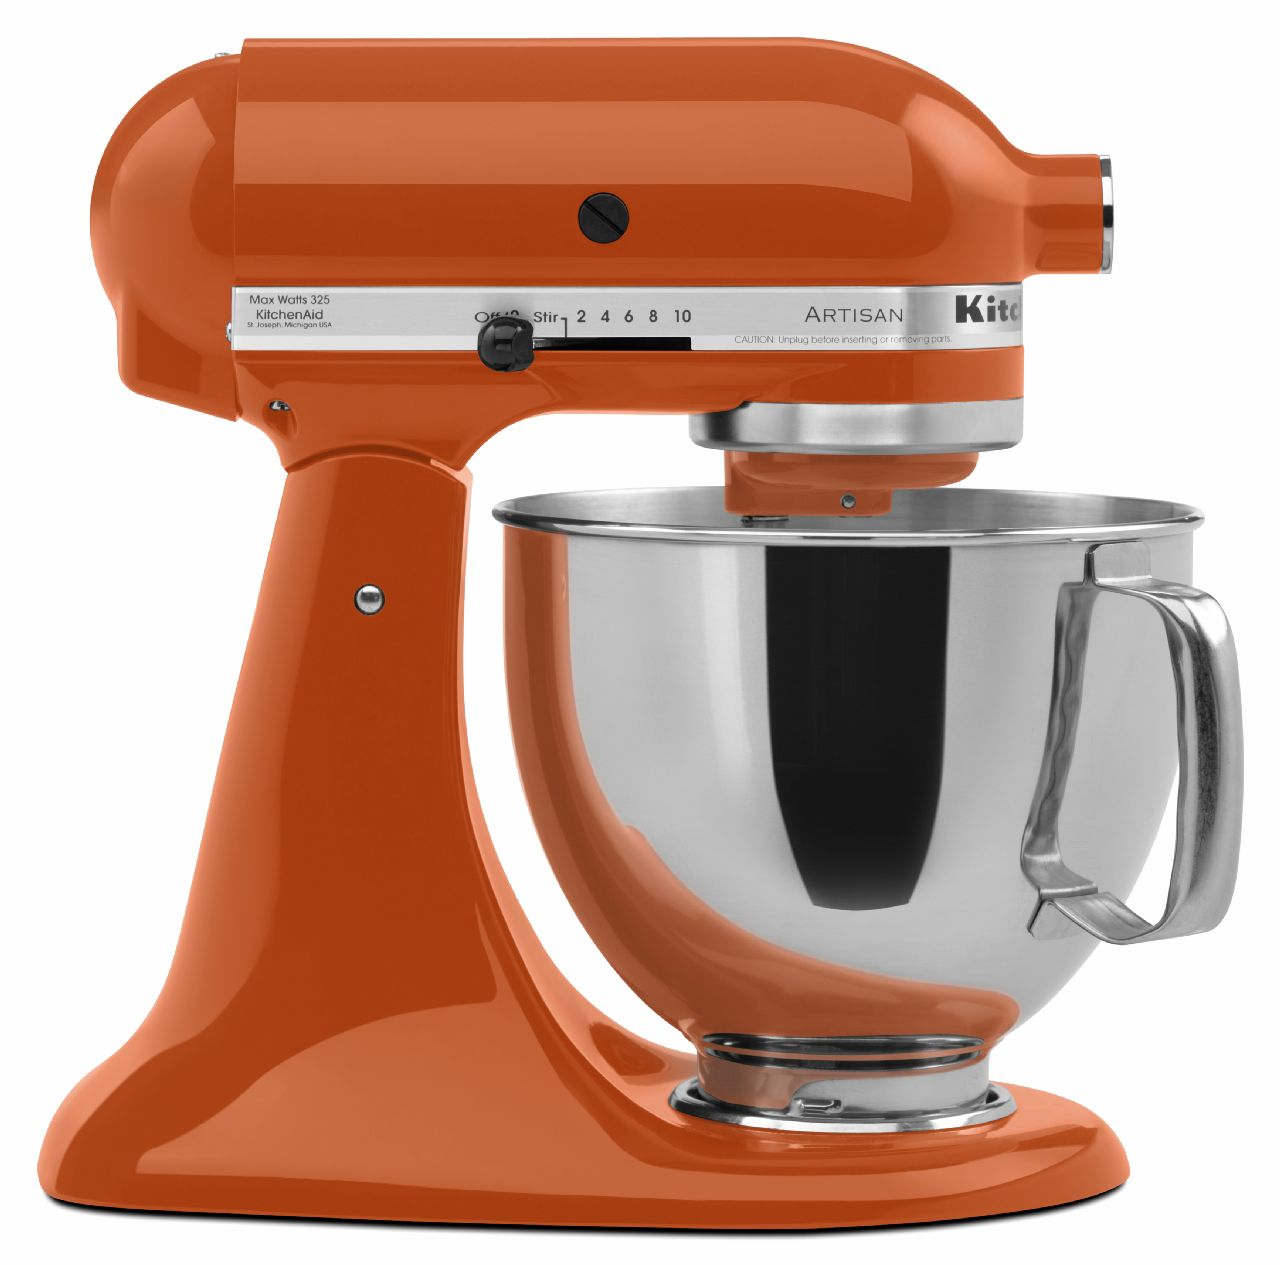 KitchenAid KSM150PSPN Artisan Series 5-Quart Stand Mixer, Persimmon